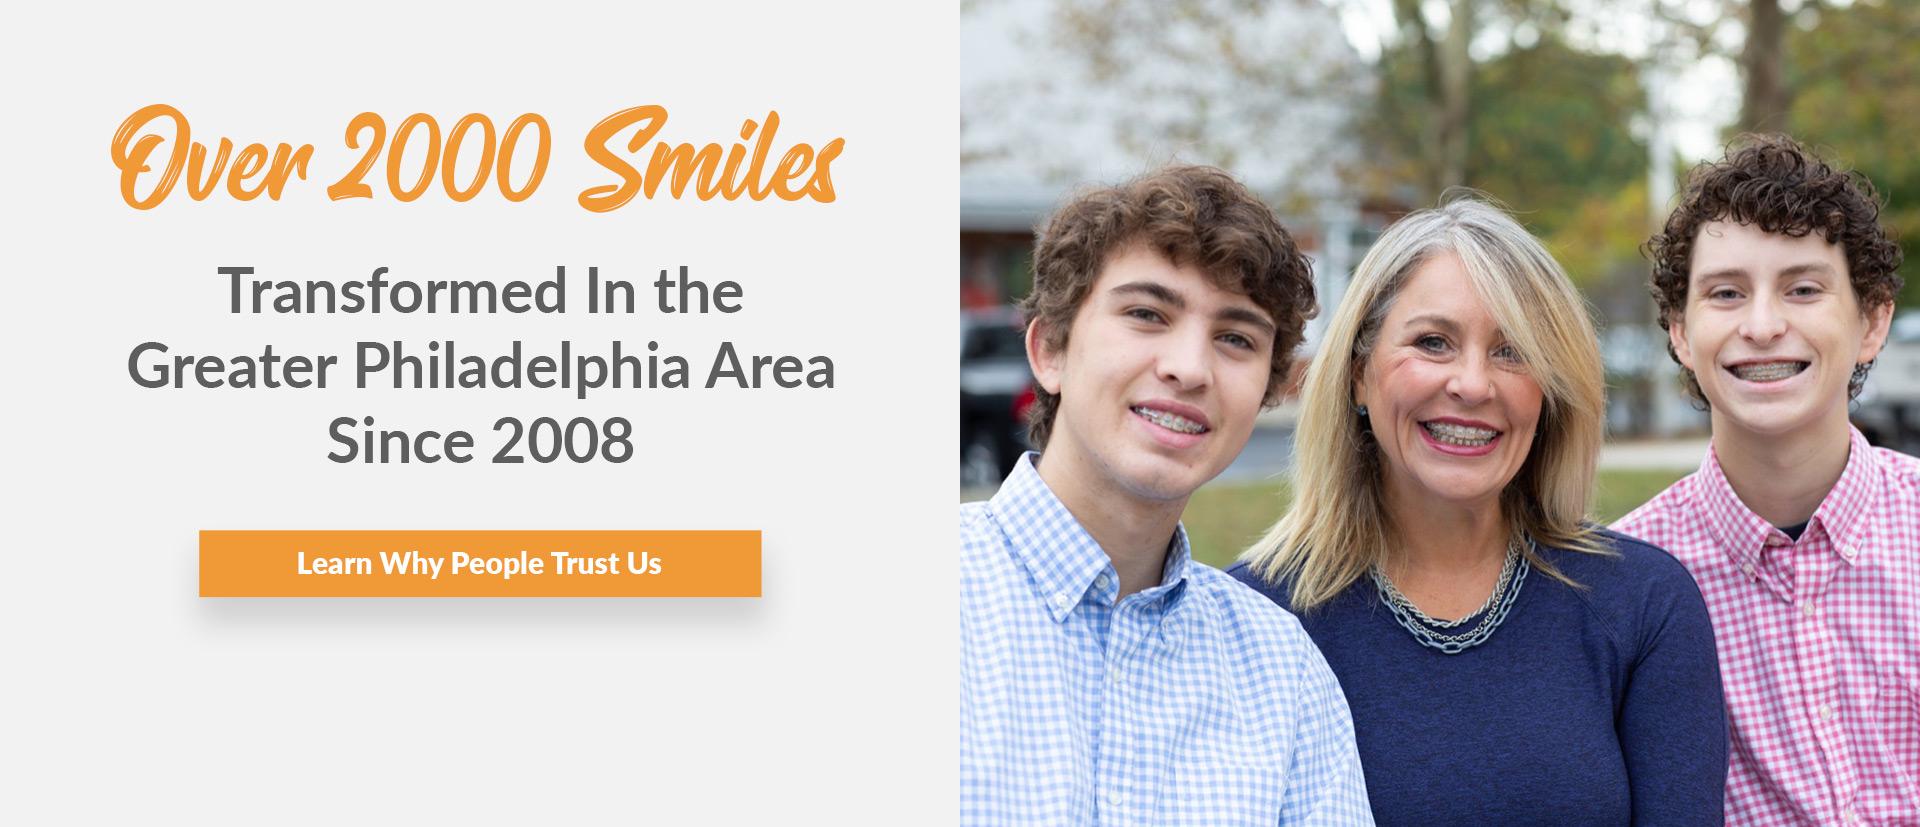 learn why people trust tamburrino family orthodontics